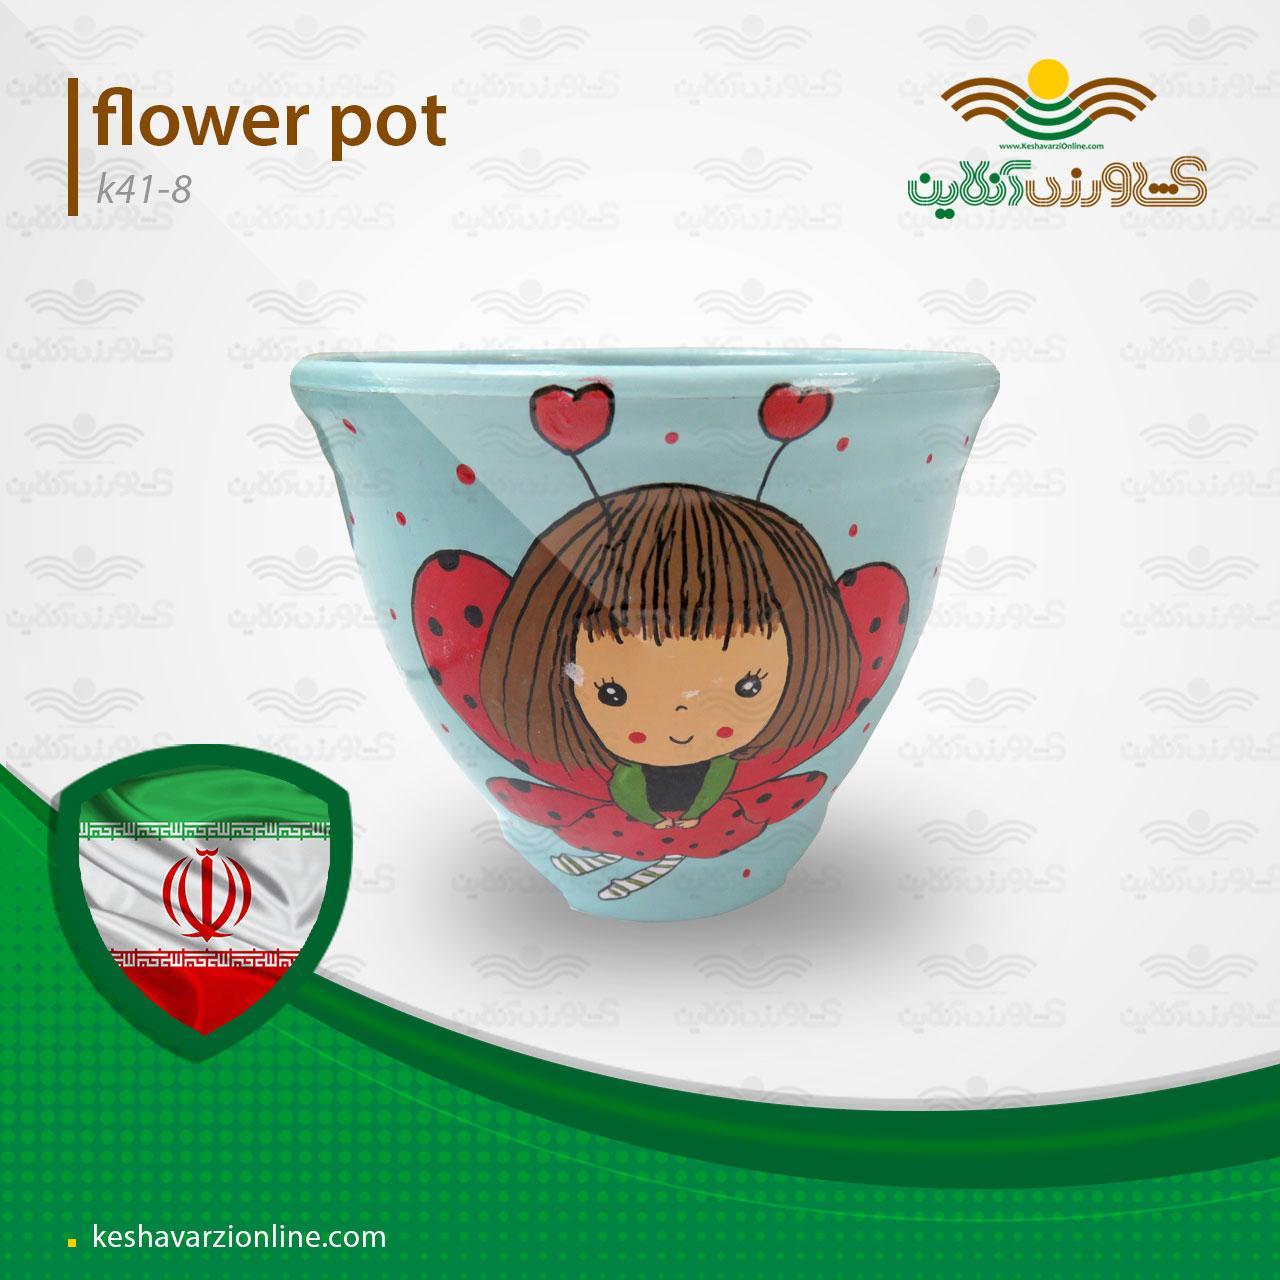 گلدان دکوری K41.8